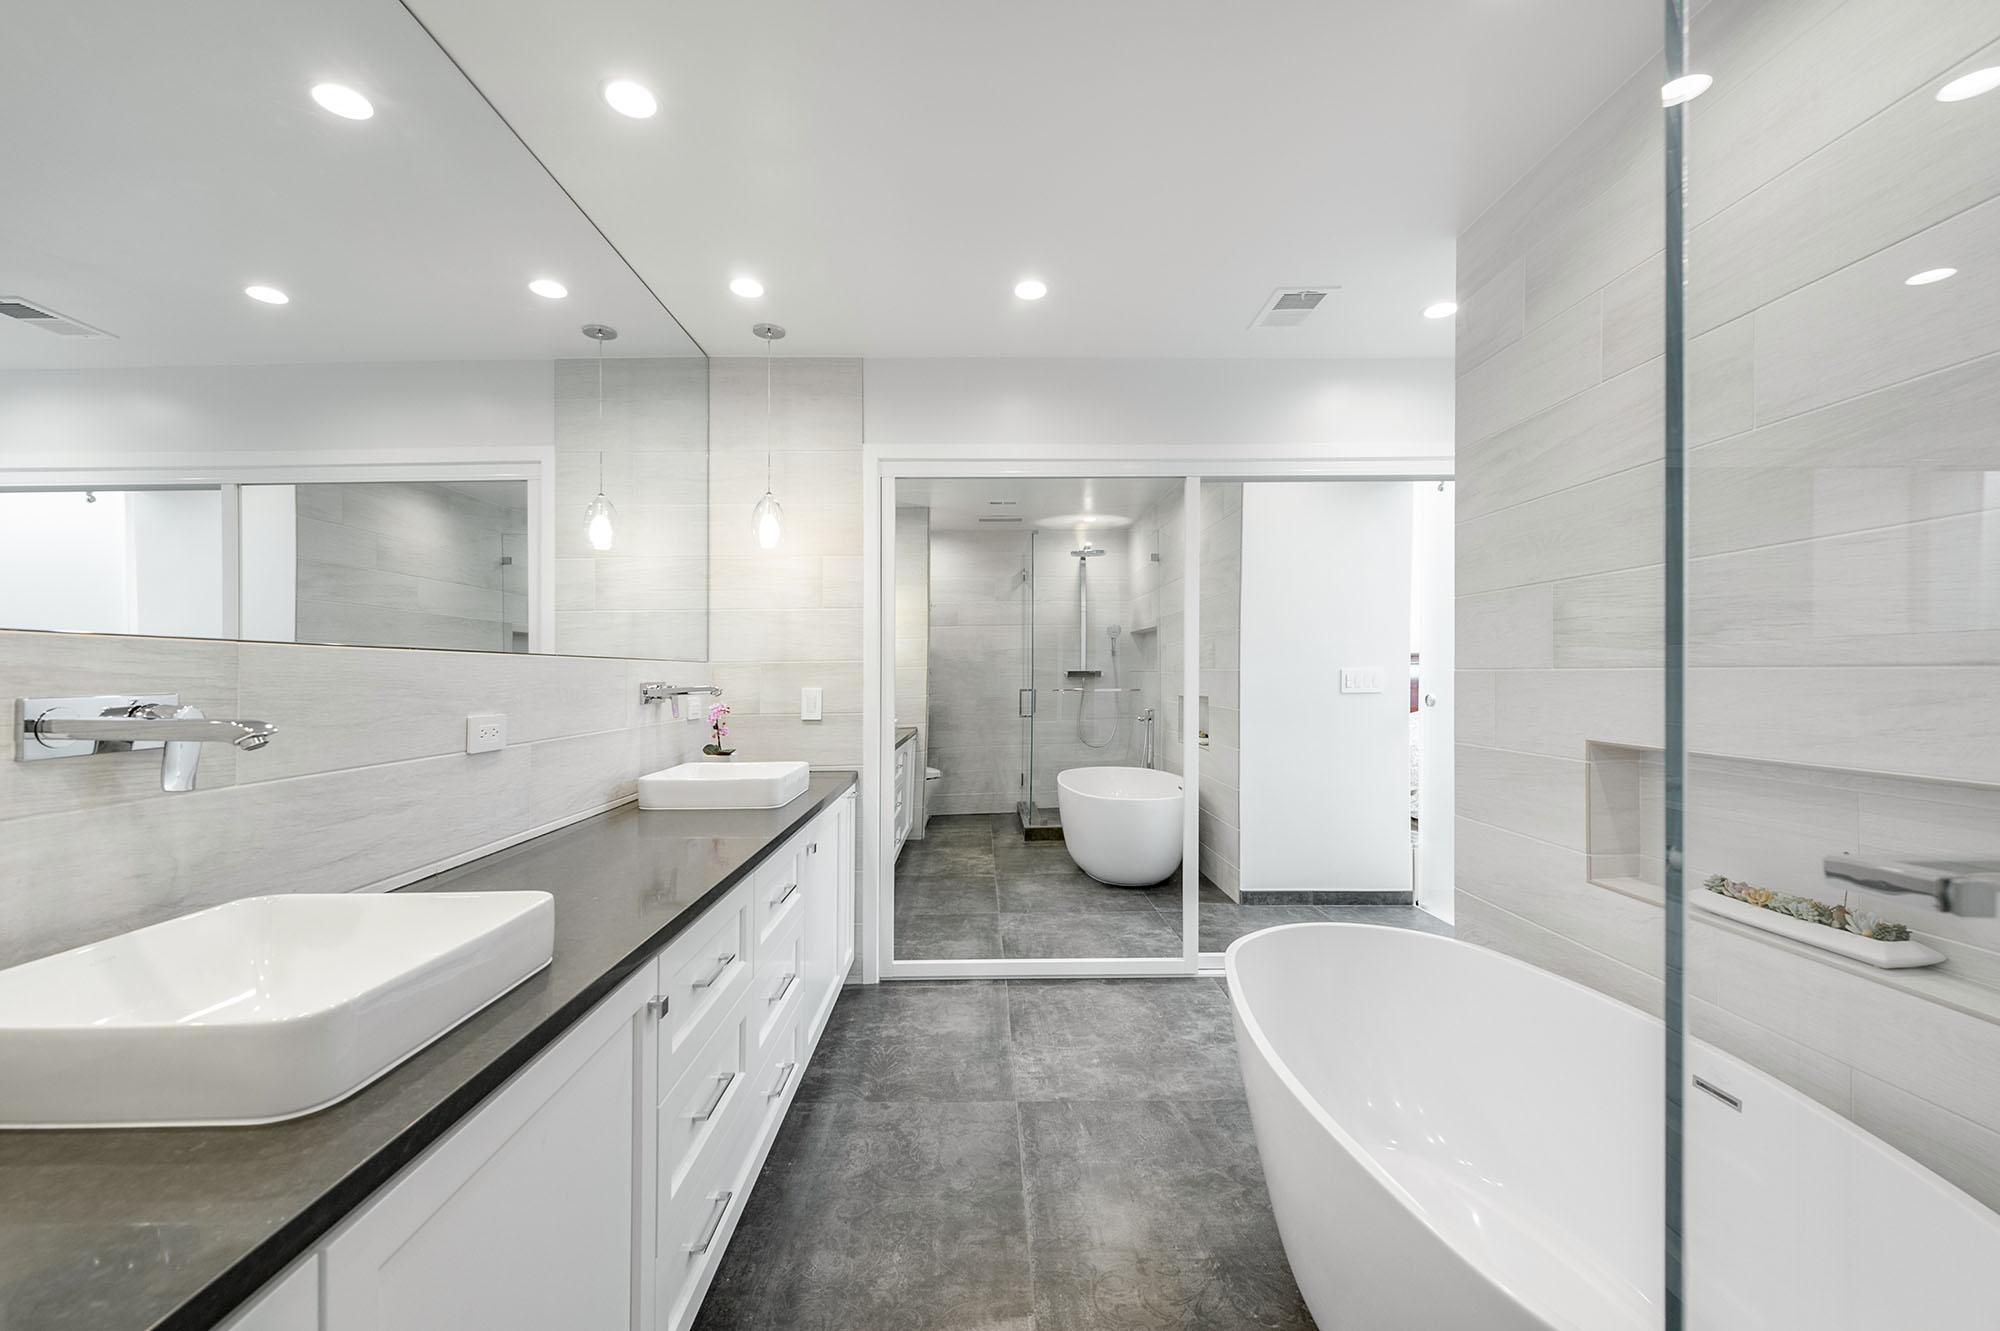 Beverly Glen Bathroom Remodel small 10.jpg